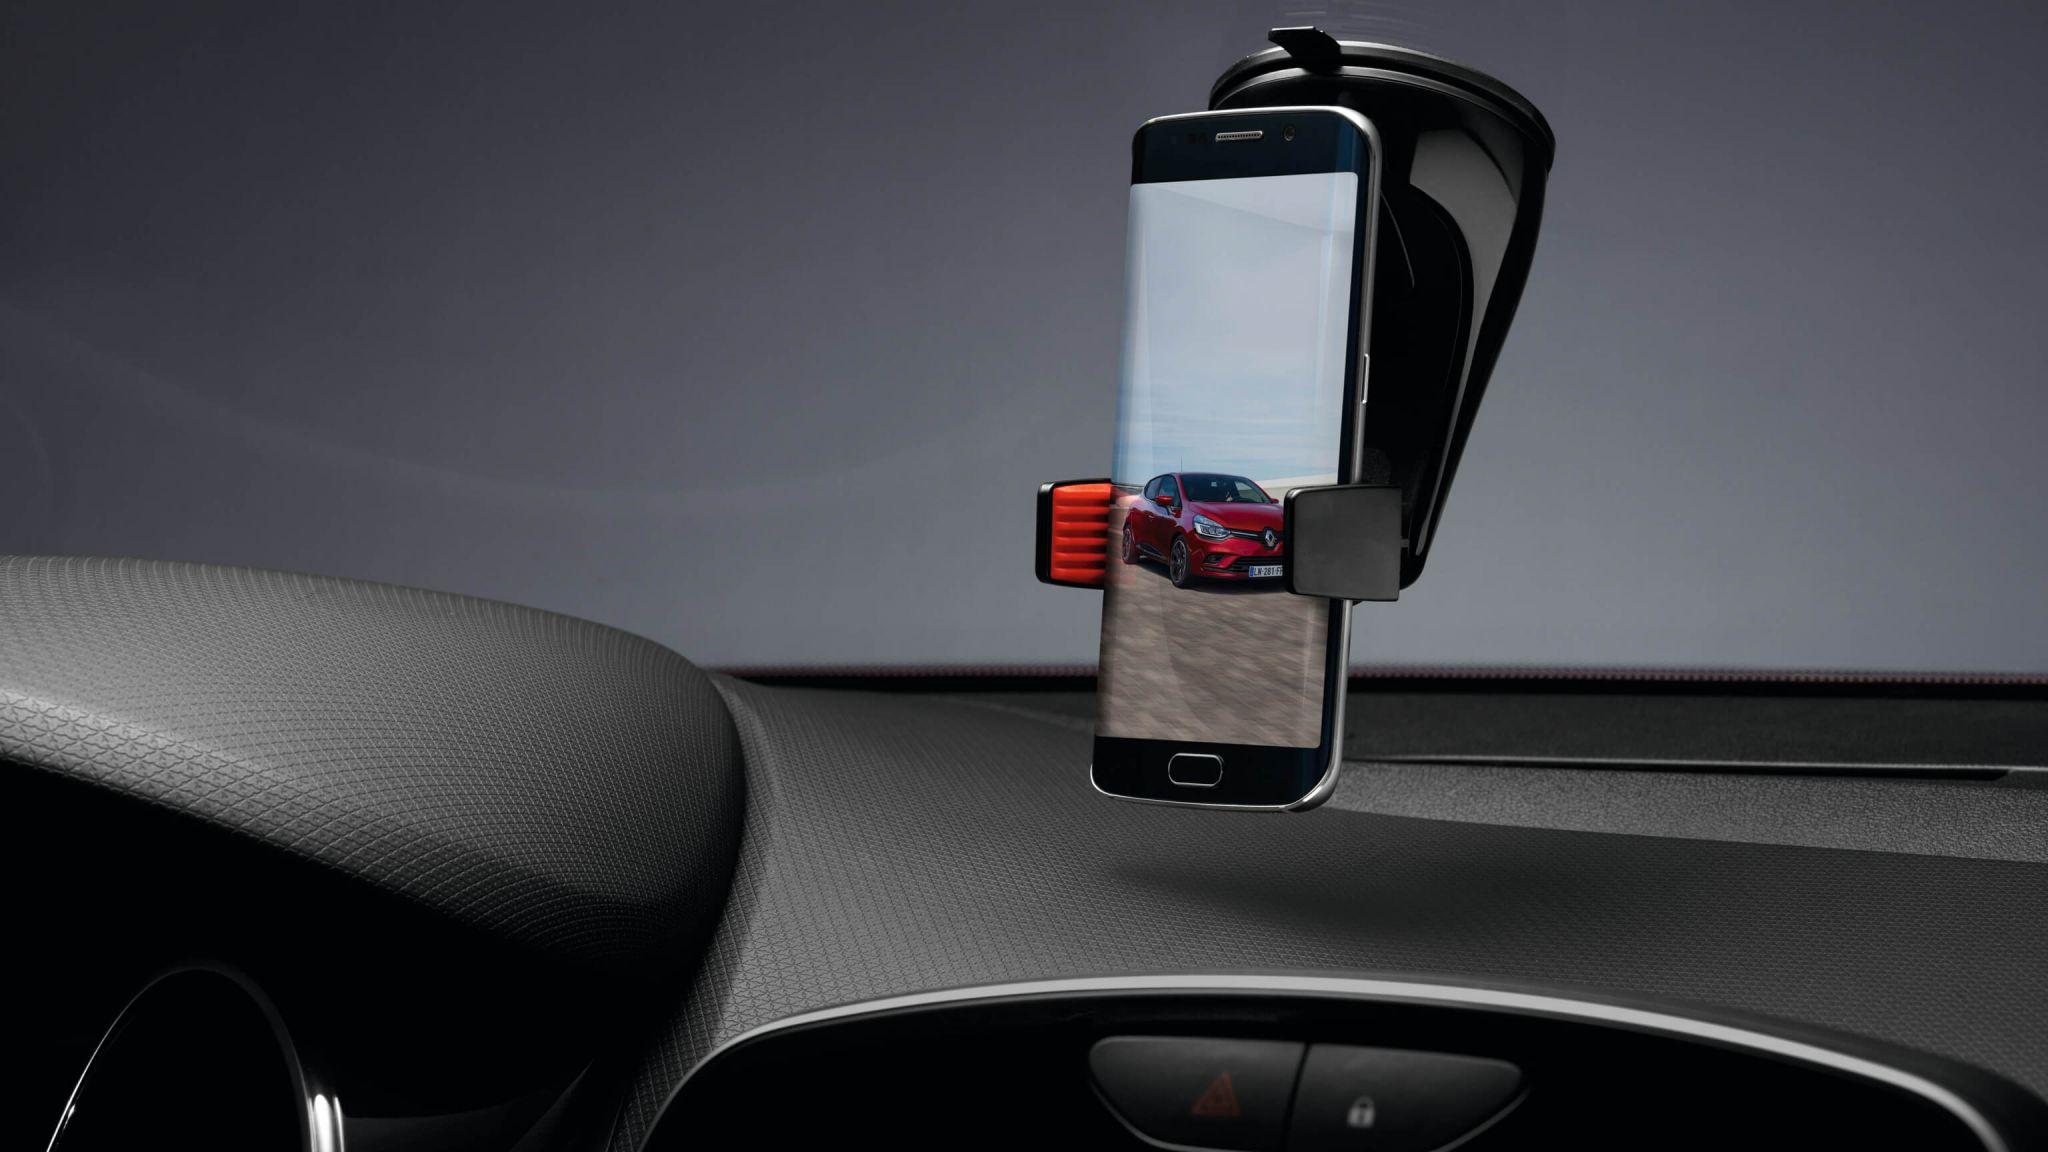 Renault Clio Accessoires Telefoonhouder